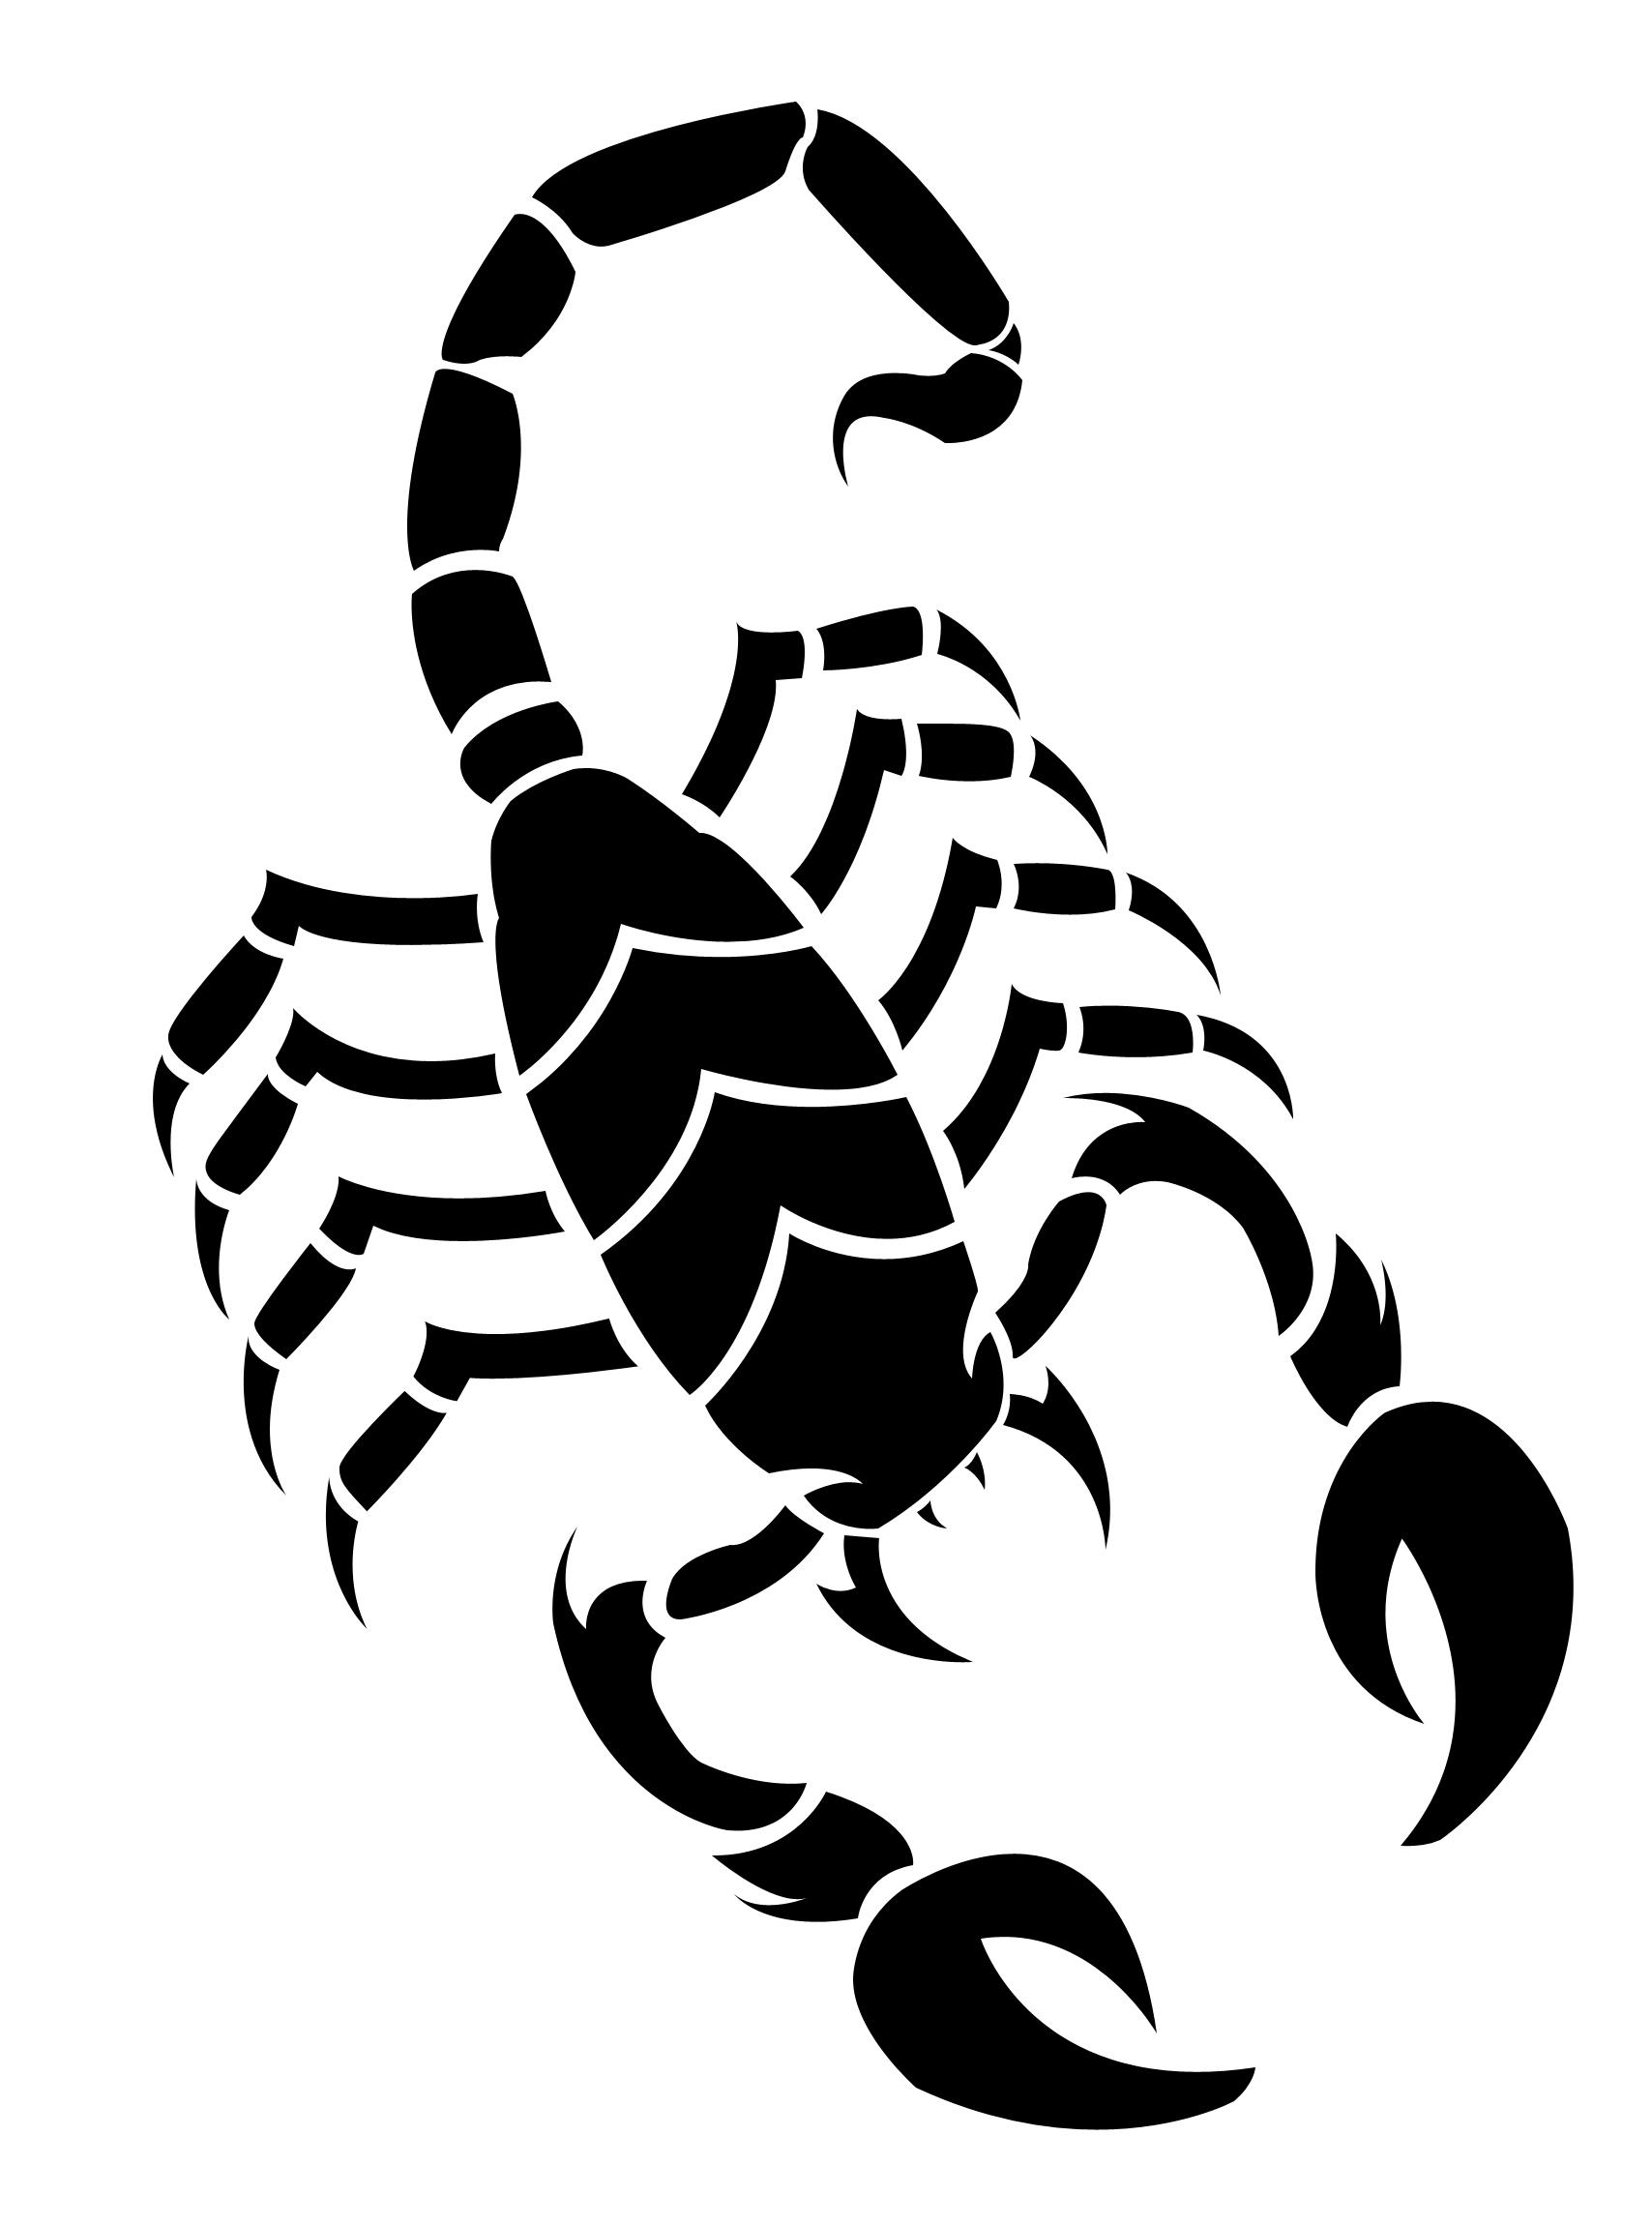 Scorpion clipart #15